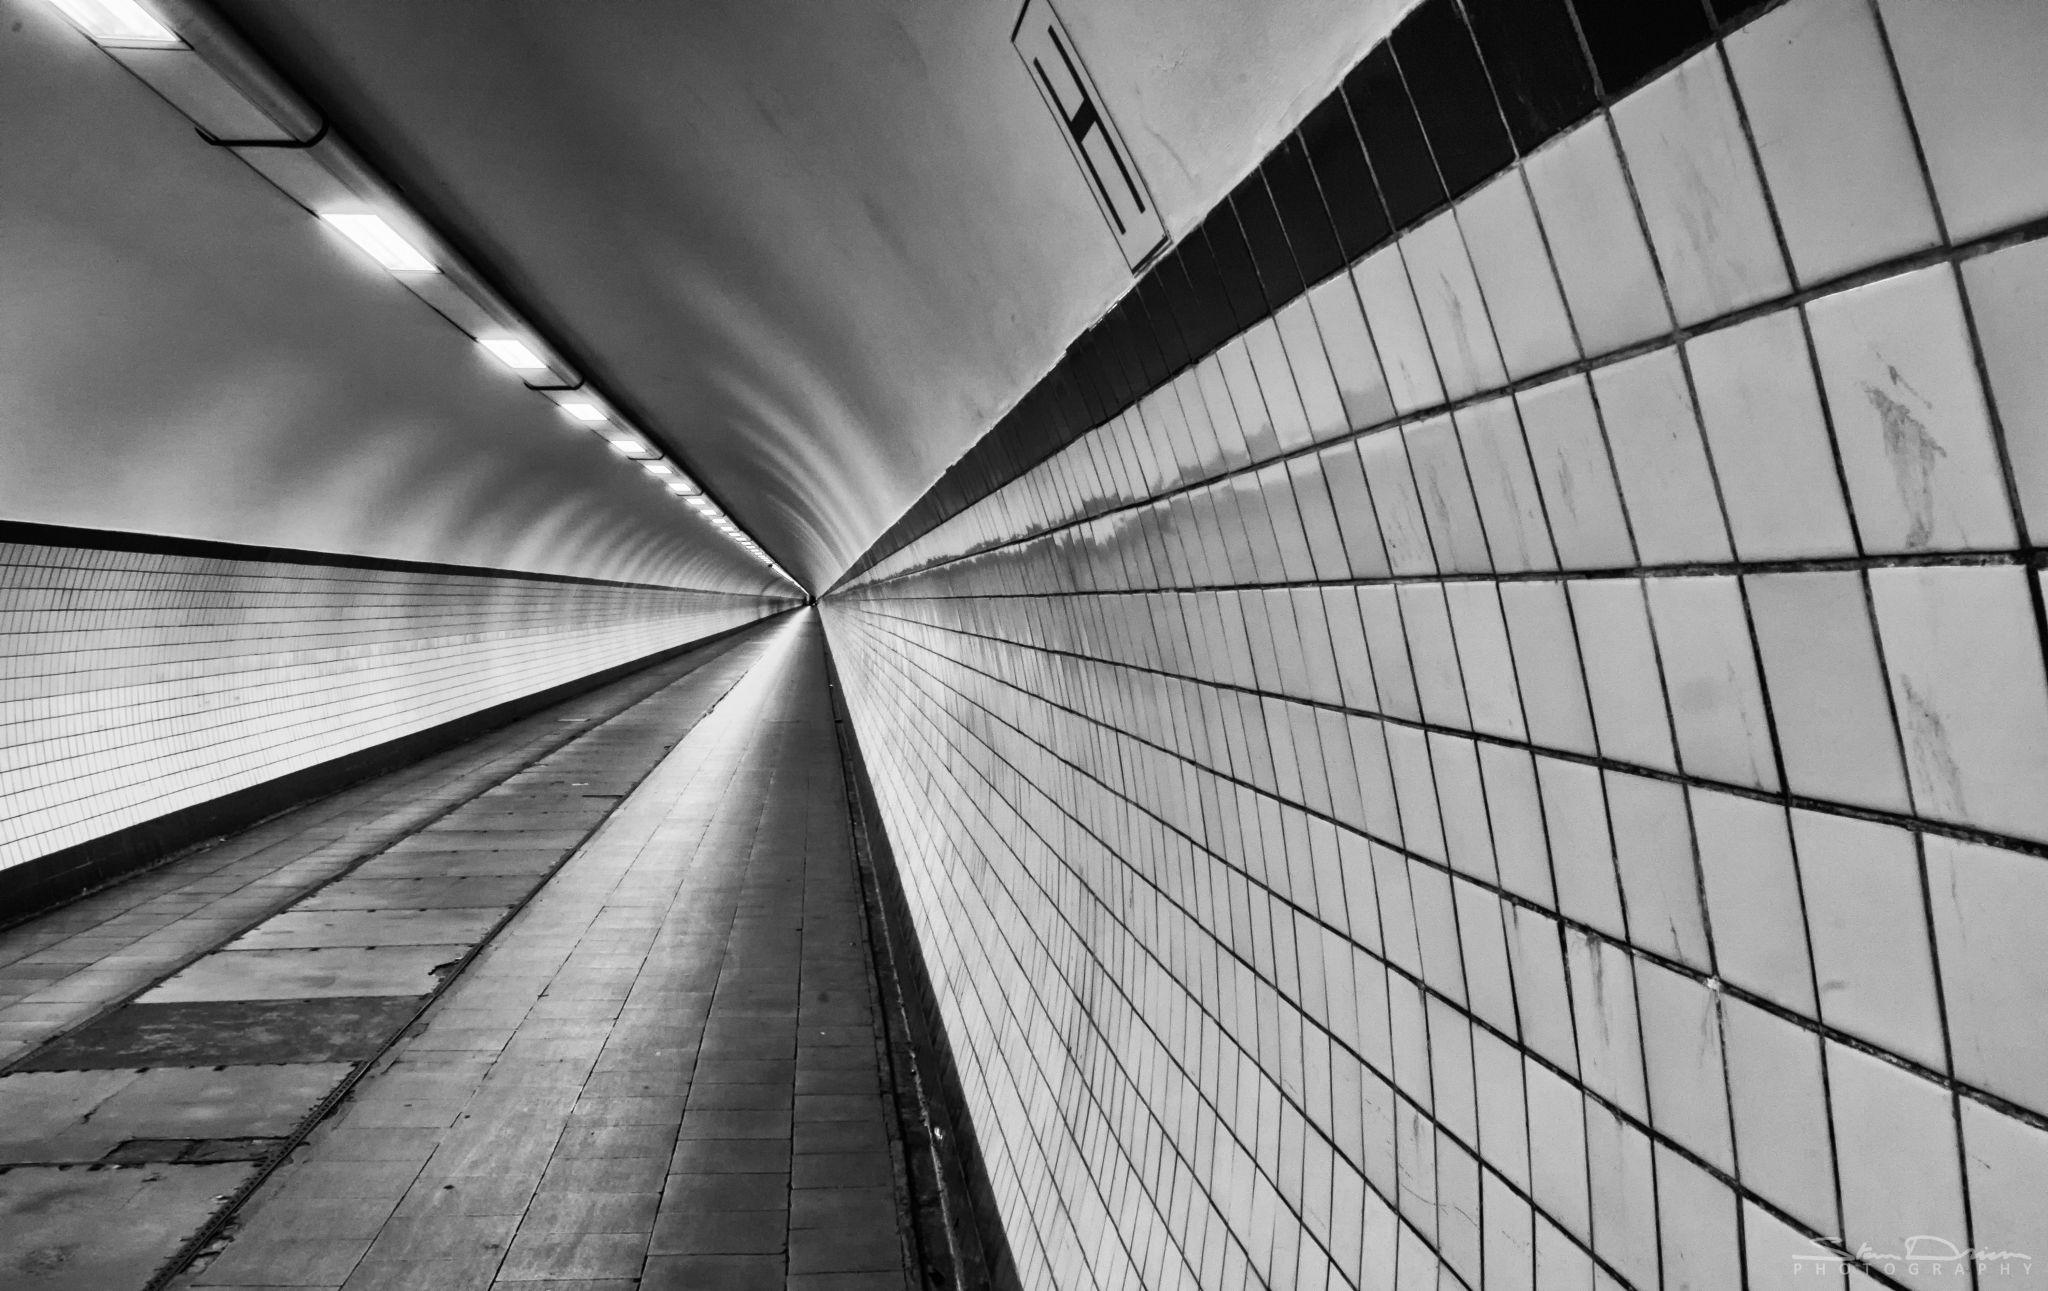 Pedestrian tunnel, Antwerp, Belgium